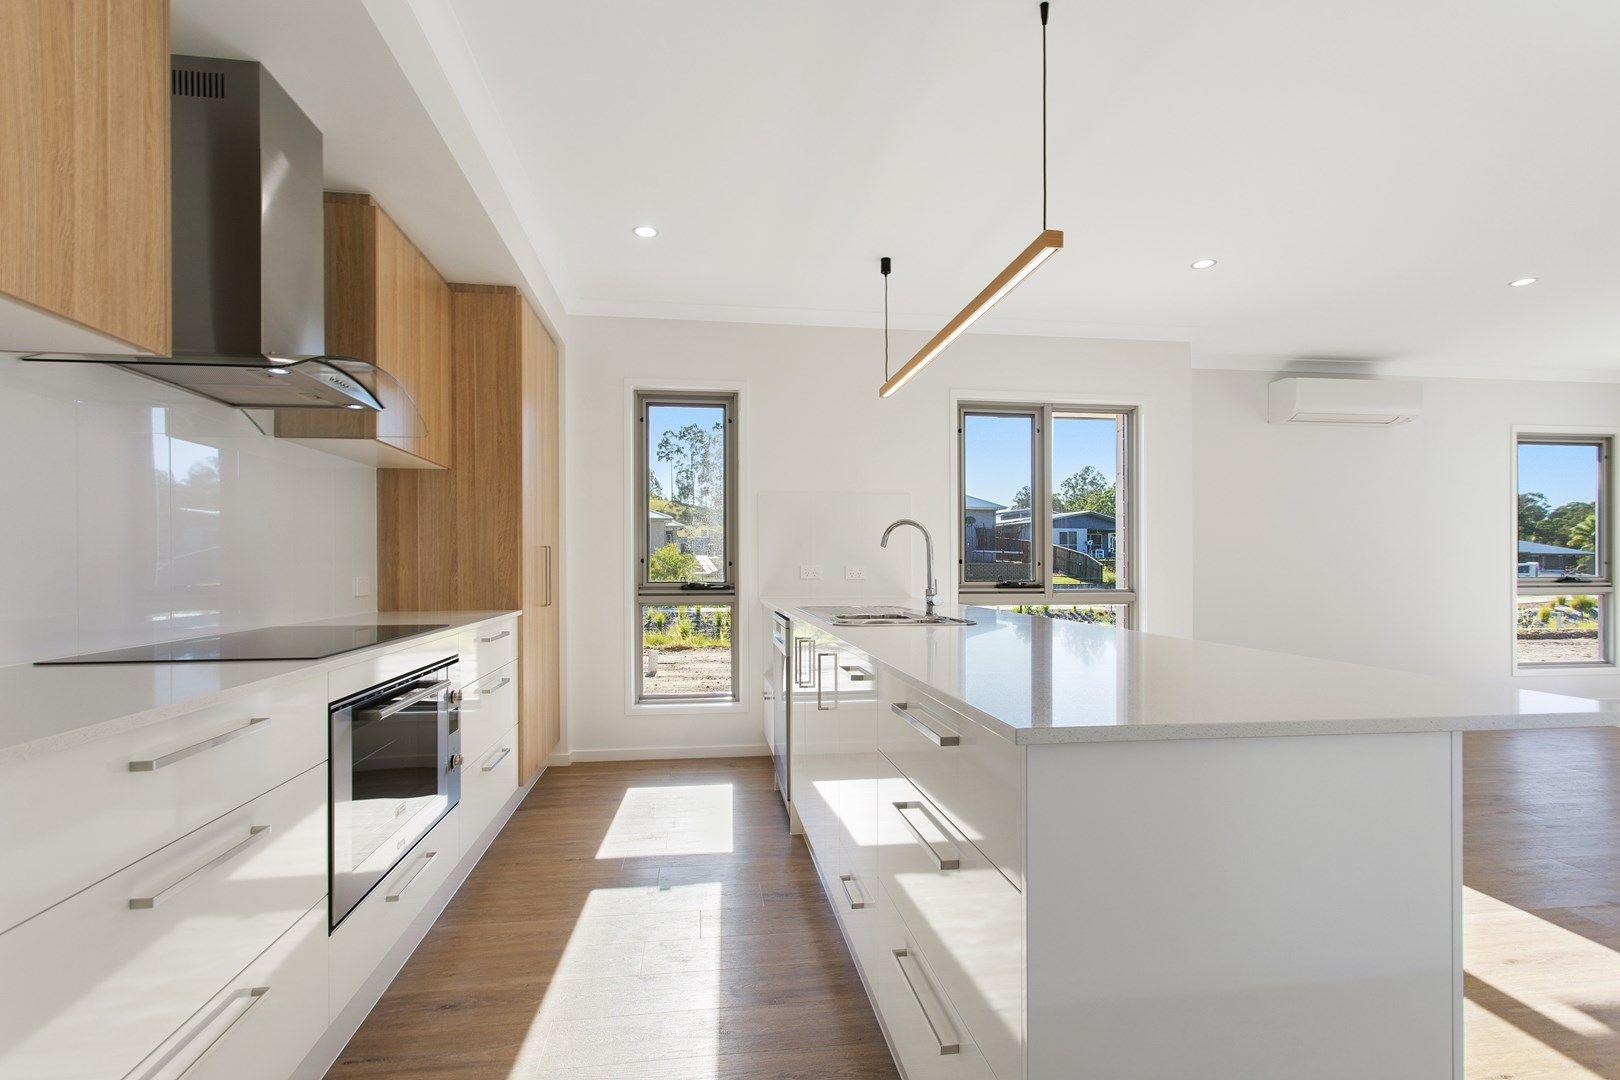 Lot 6 Cedarwood Place, Landsborough QLD 4550, Image 0